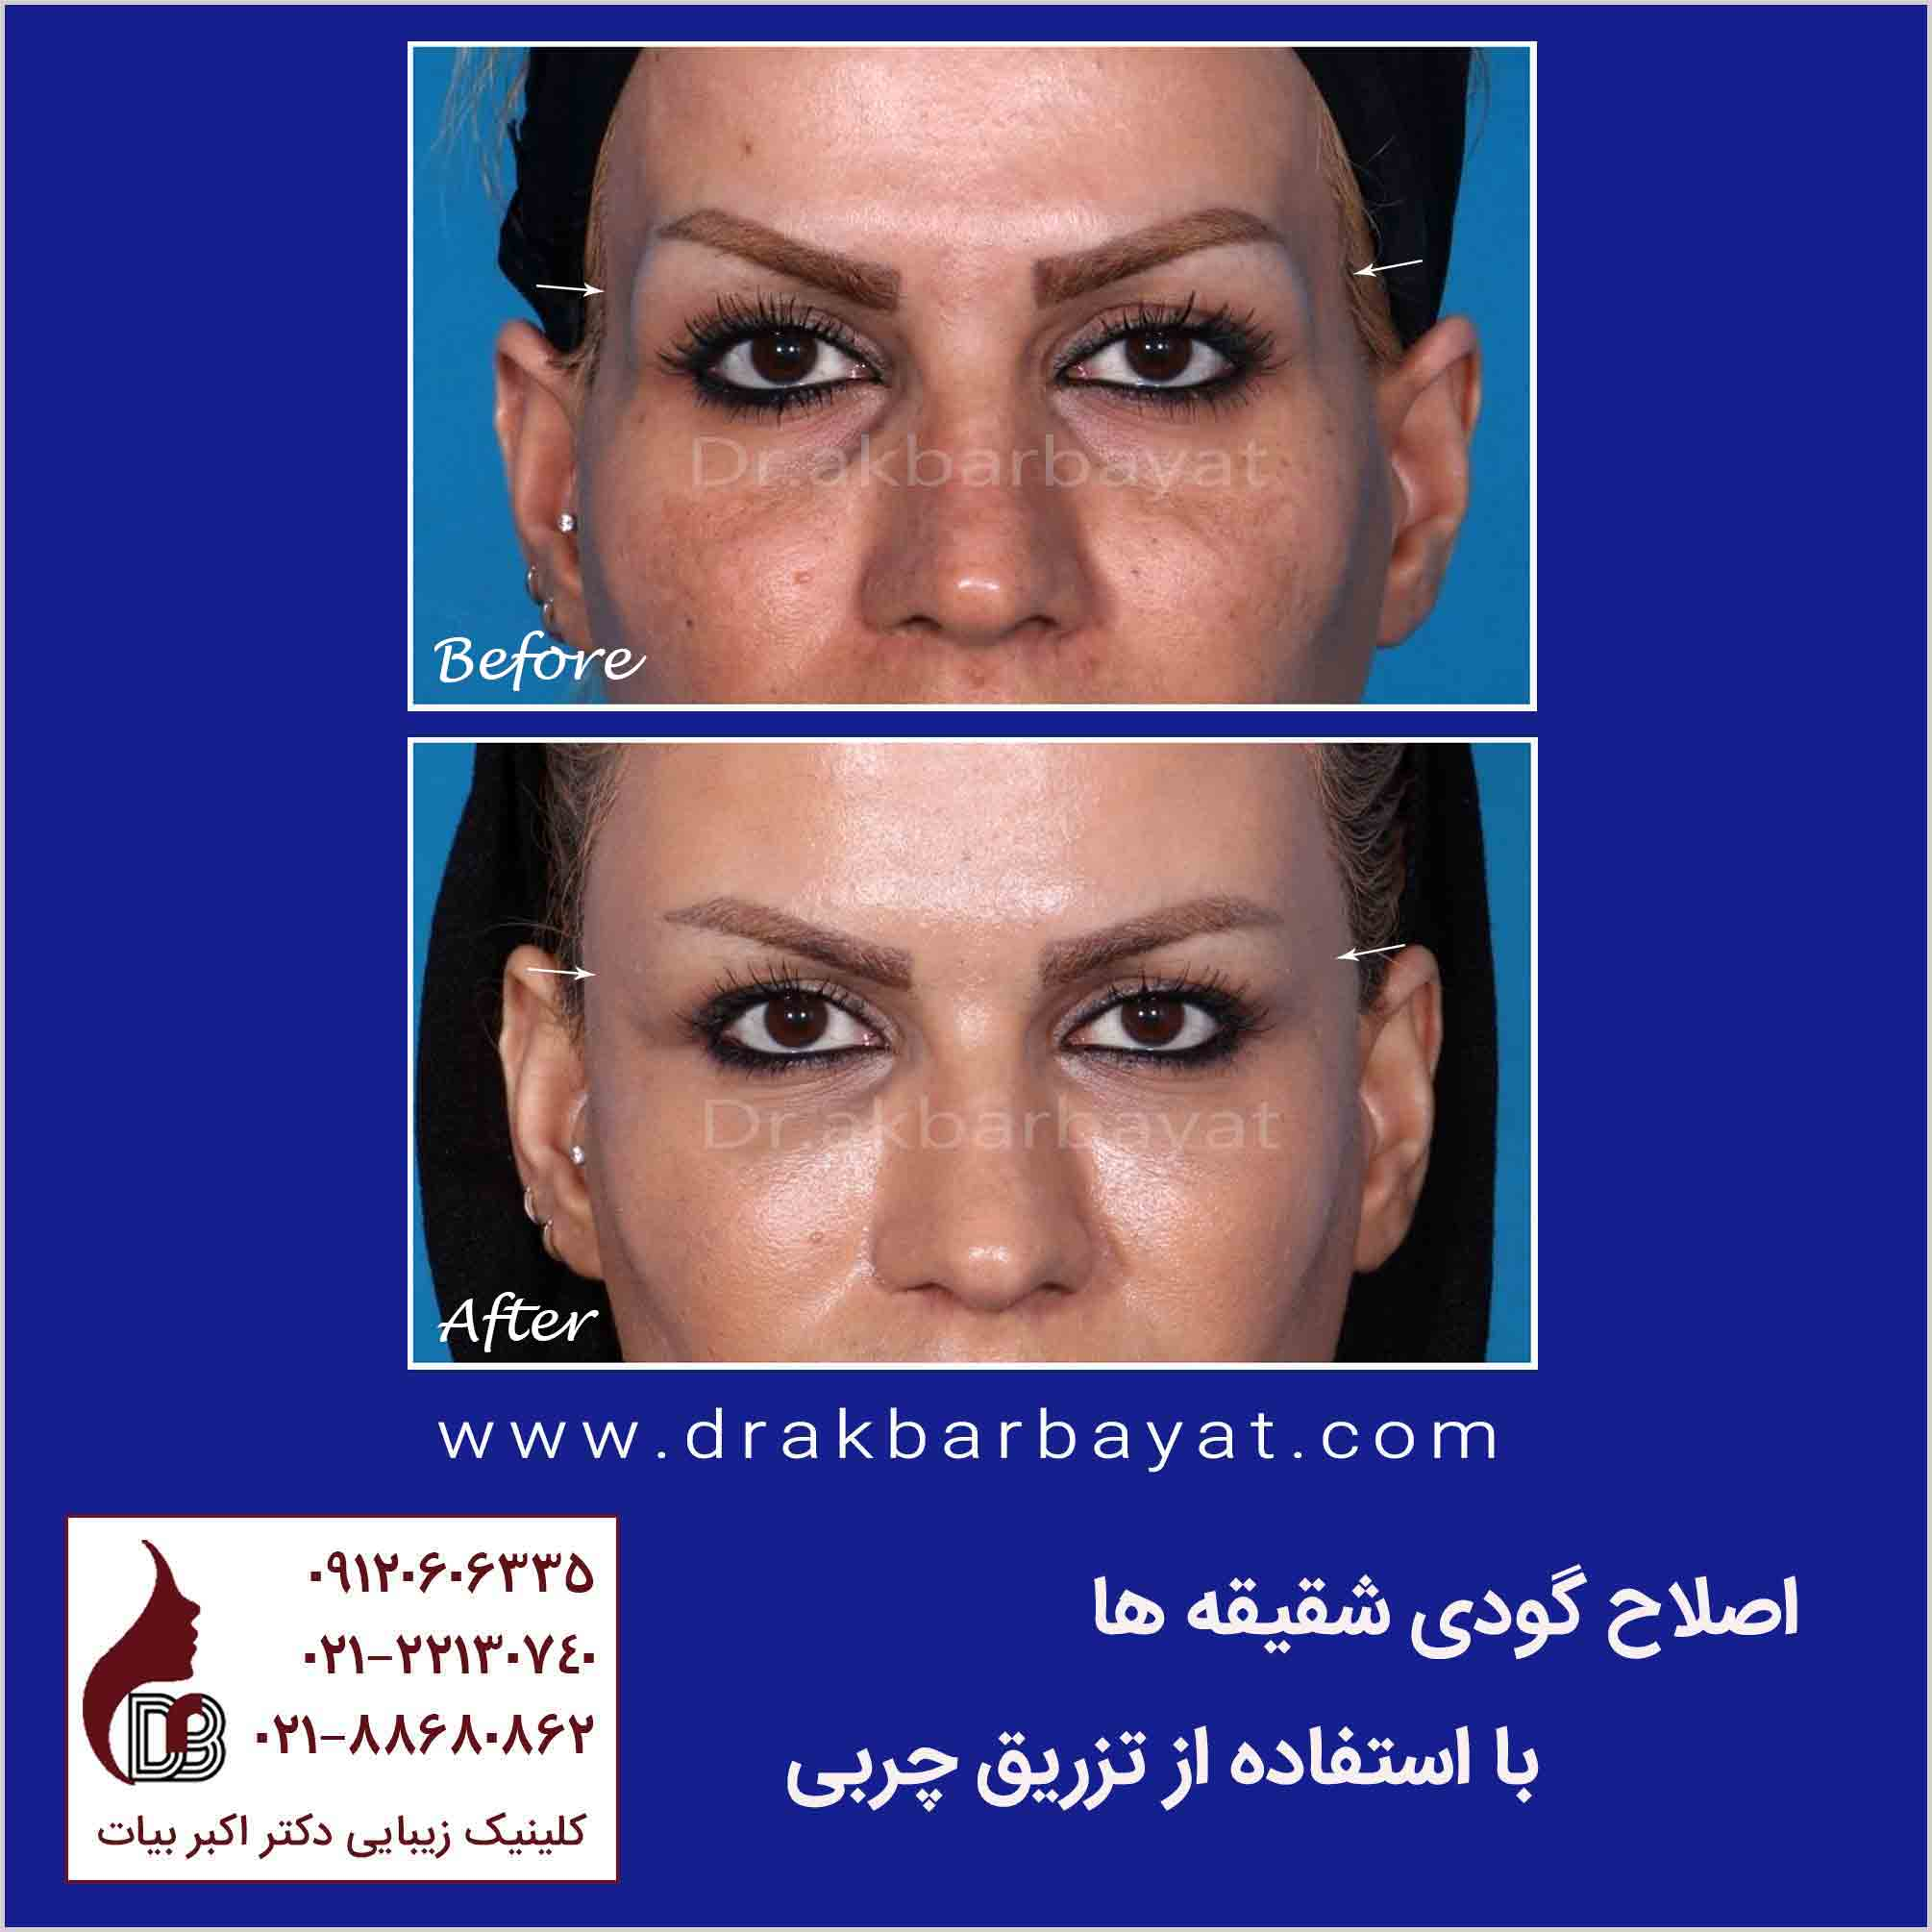 جوانسازی صورت | اصلاح گودی صورت